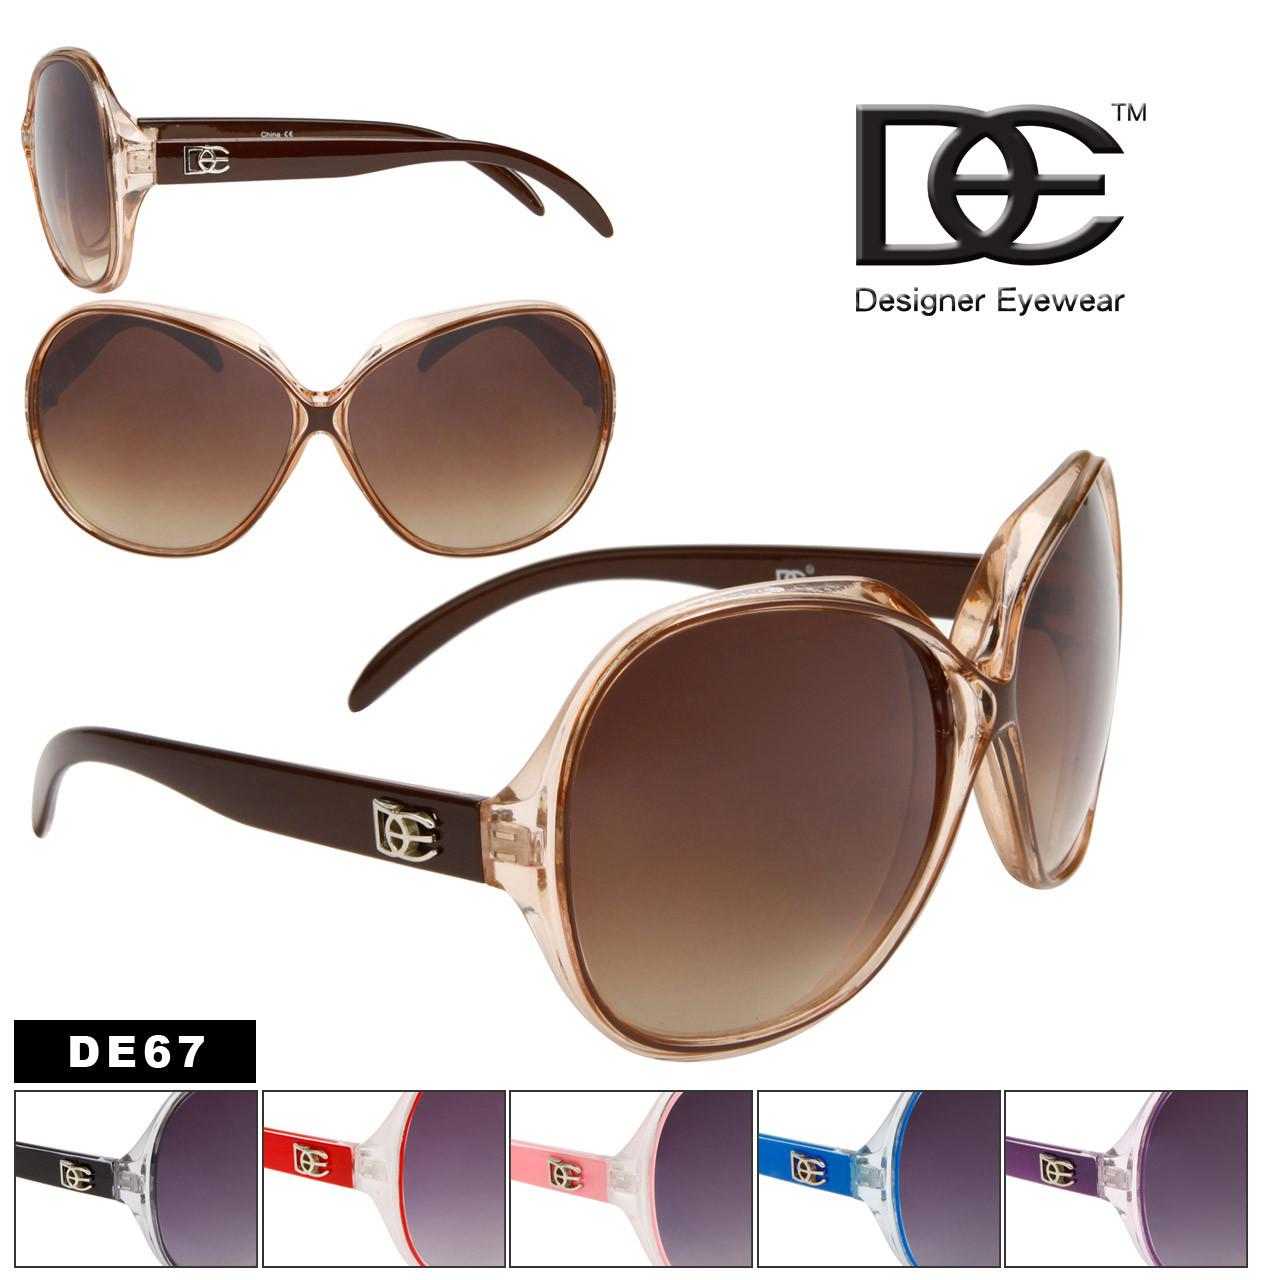 Wholesale Designer Sunglasses - DE67